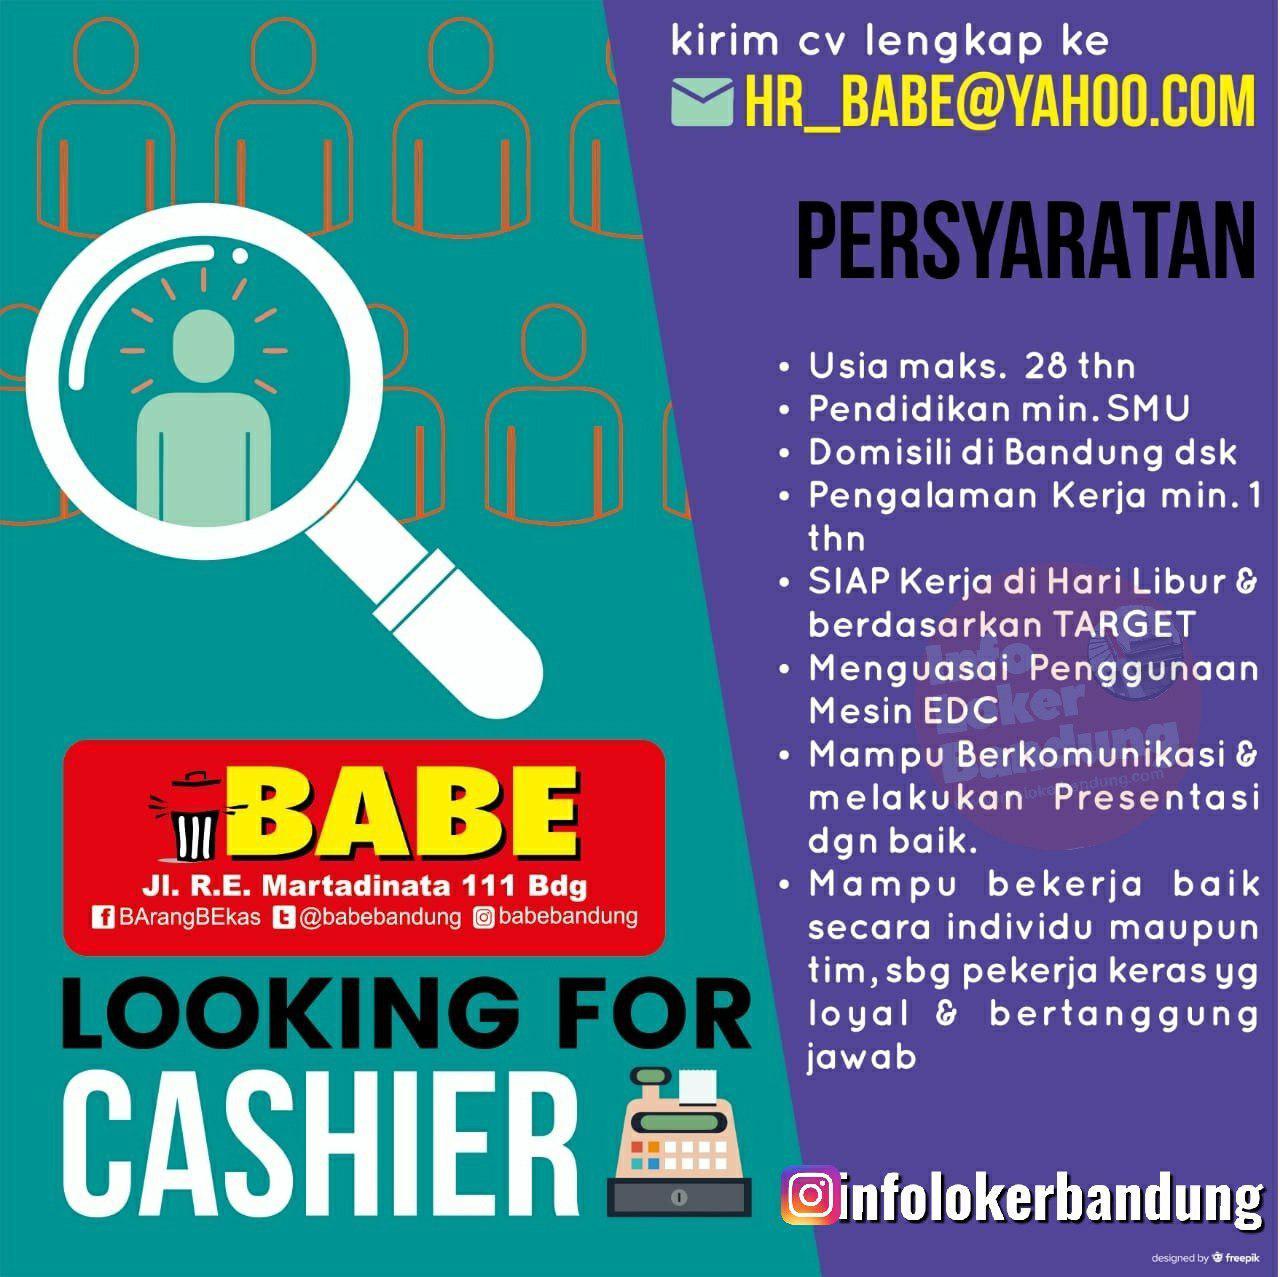 Lowongan Kerja Babe (Barang Bekas) Bandung Juni 2019